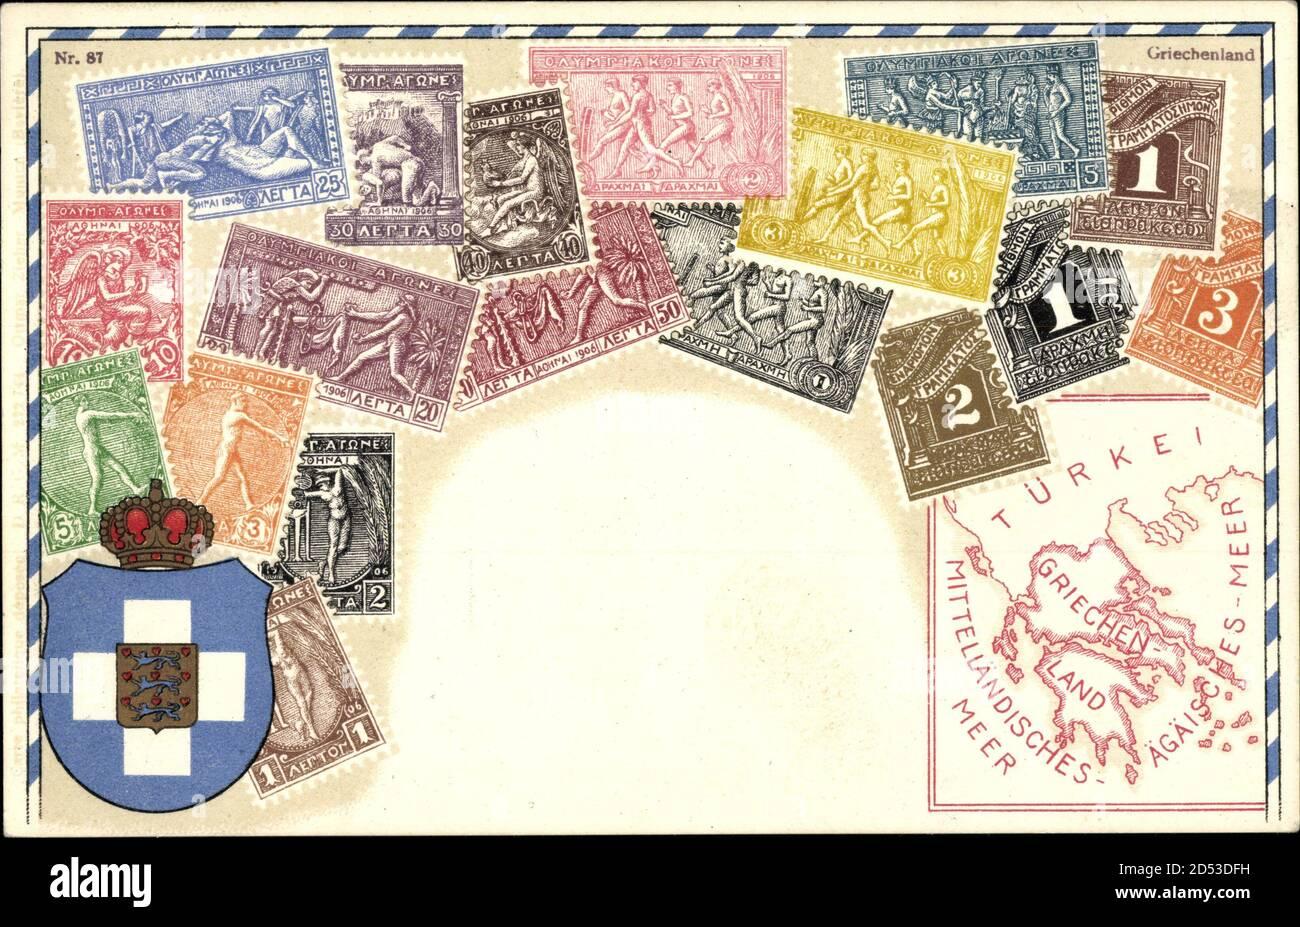 Briemarken Wappen Griechenland, Olympische Szenen, Türkei, Ägäis, Drachmen   uso en todo el mundo Foto de stock